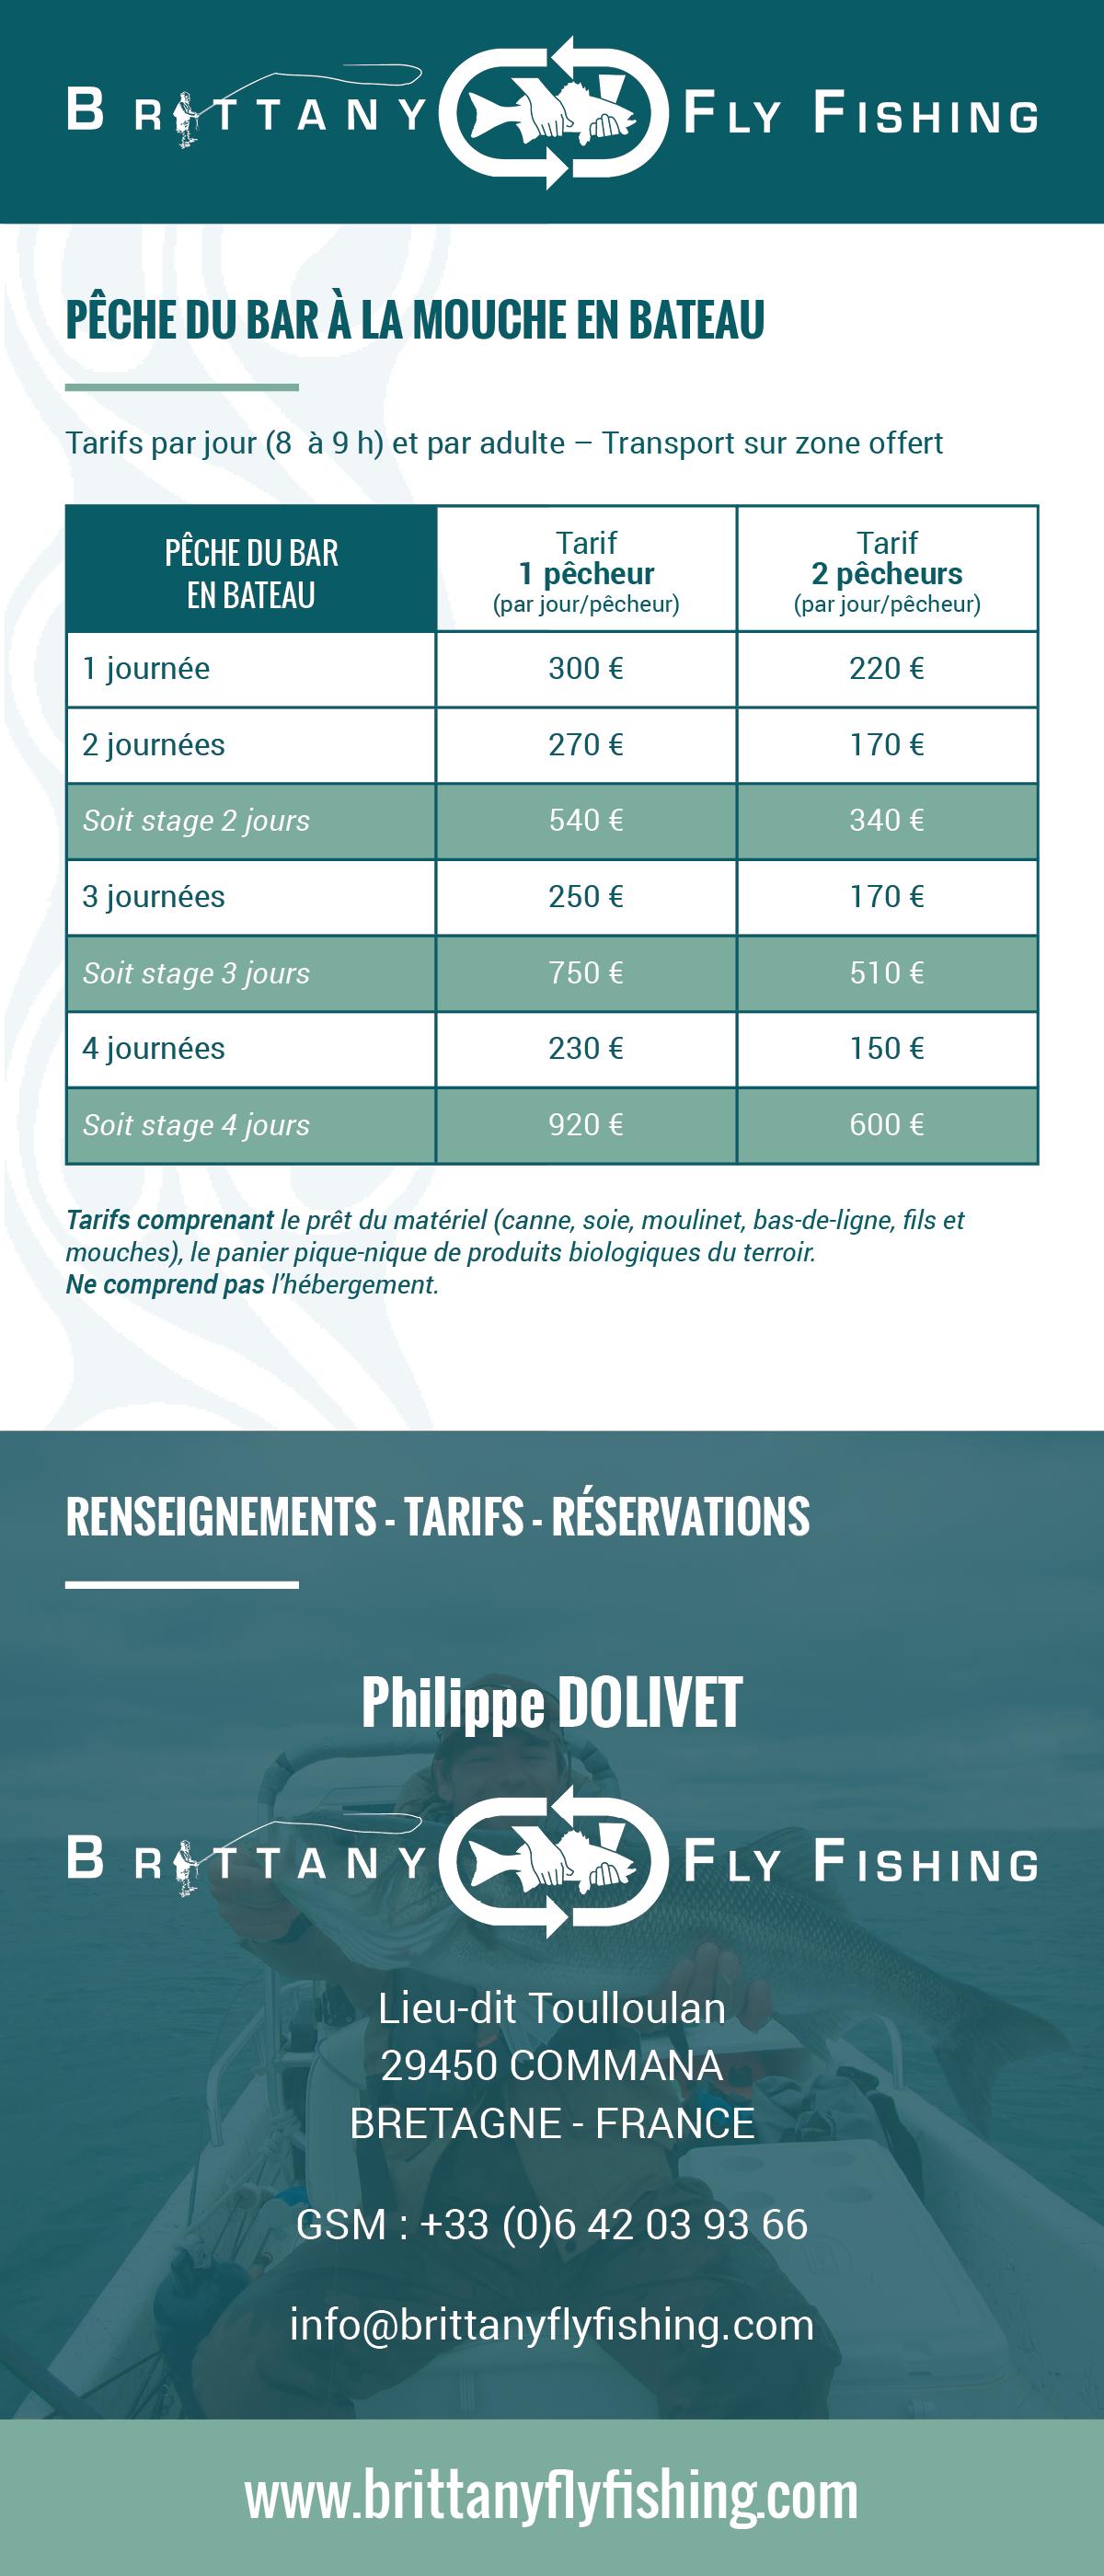 brittany-fly-fishing-tarifs-fr-20192